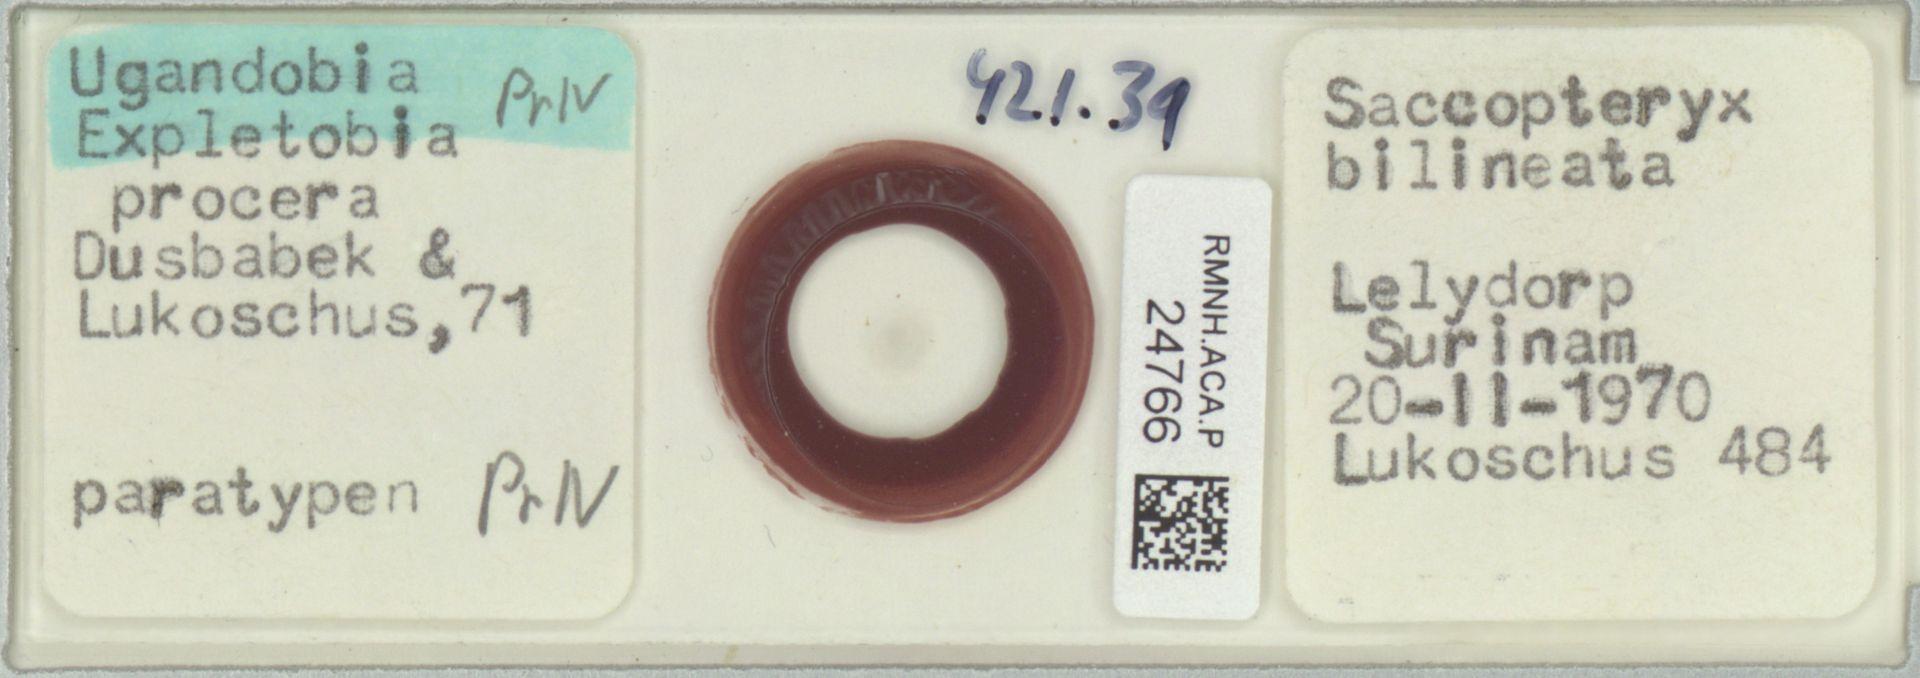 RMNH.ACA.P.24766 | Ugandobia (Expletobia) procera Dusbabek & Lukoschus, 71